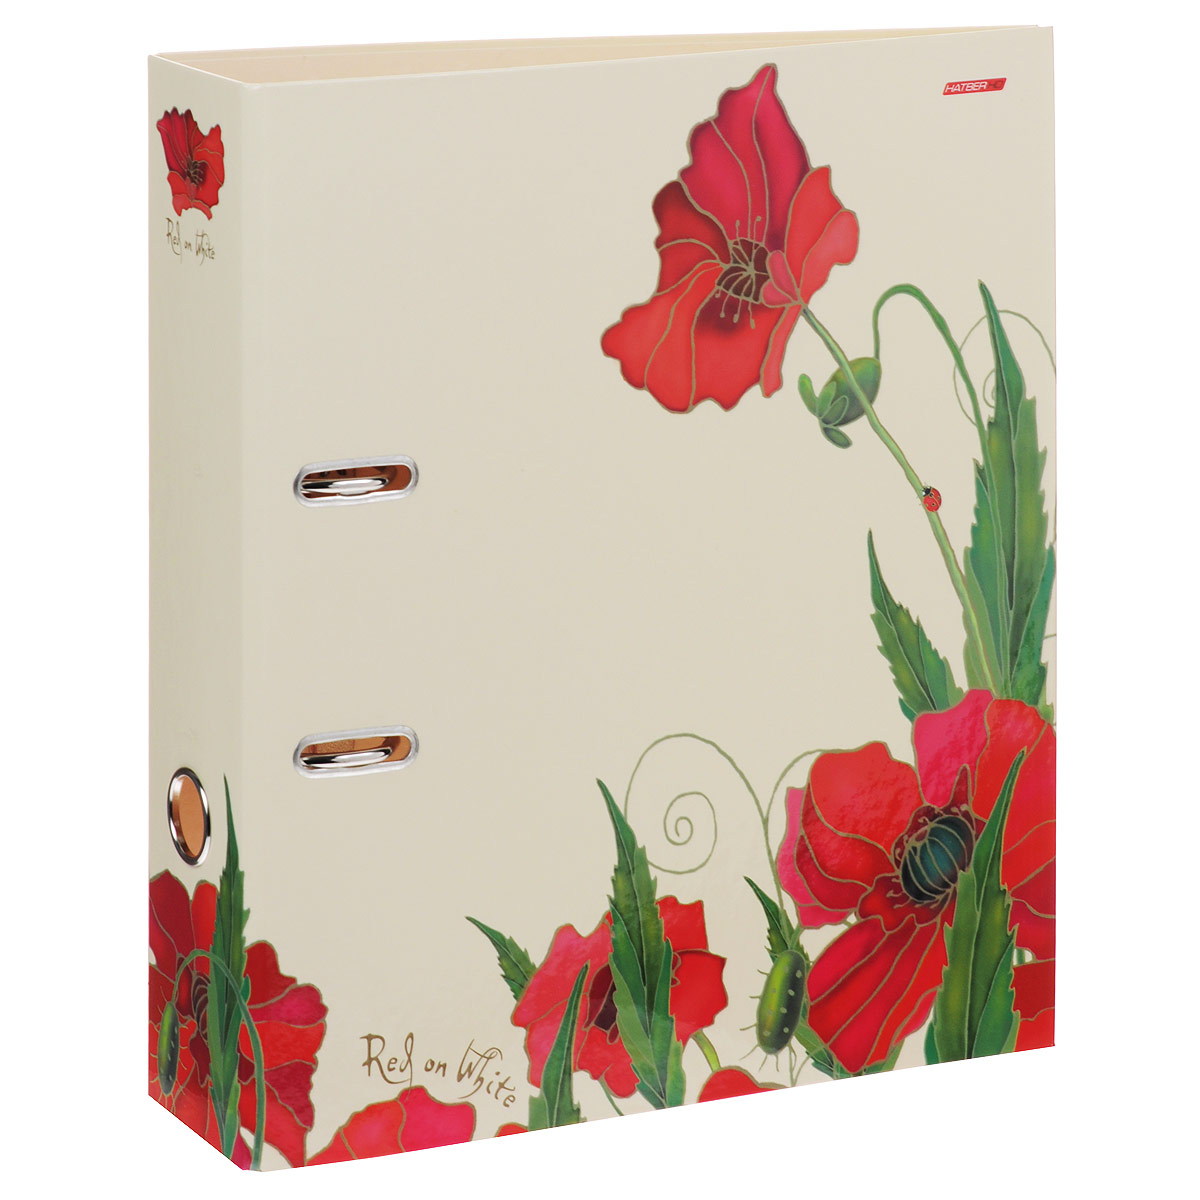 Папка-регистратор Hatber Red on White, цвет: бежевый, красный, ширина корешка 70 мм папка регистратор hatber red on black ширина корешка 70 мм цвет черный красный